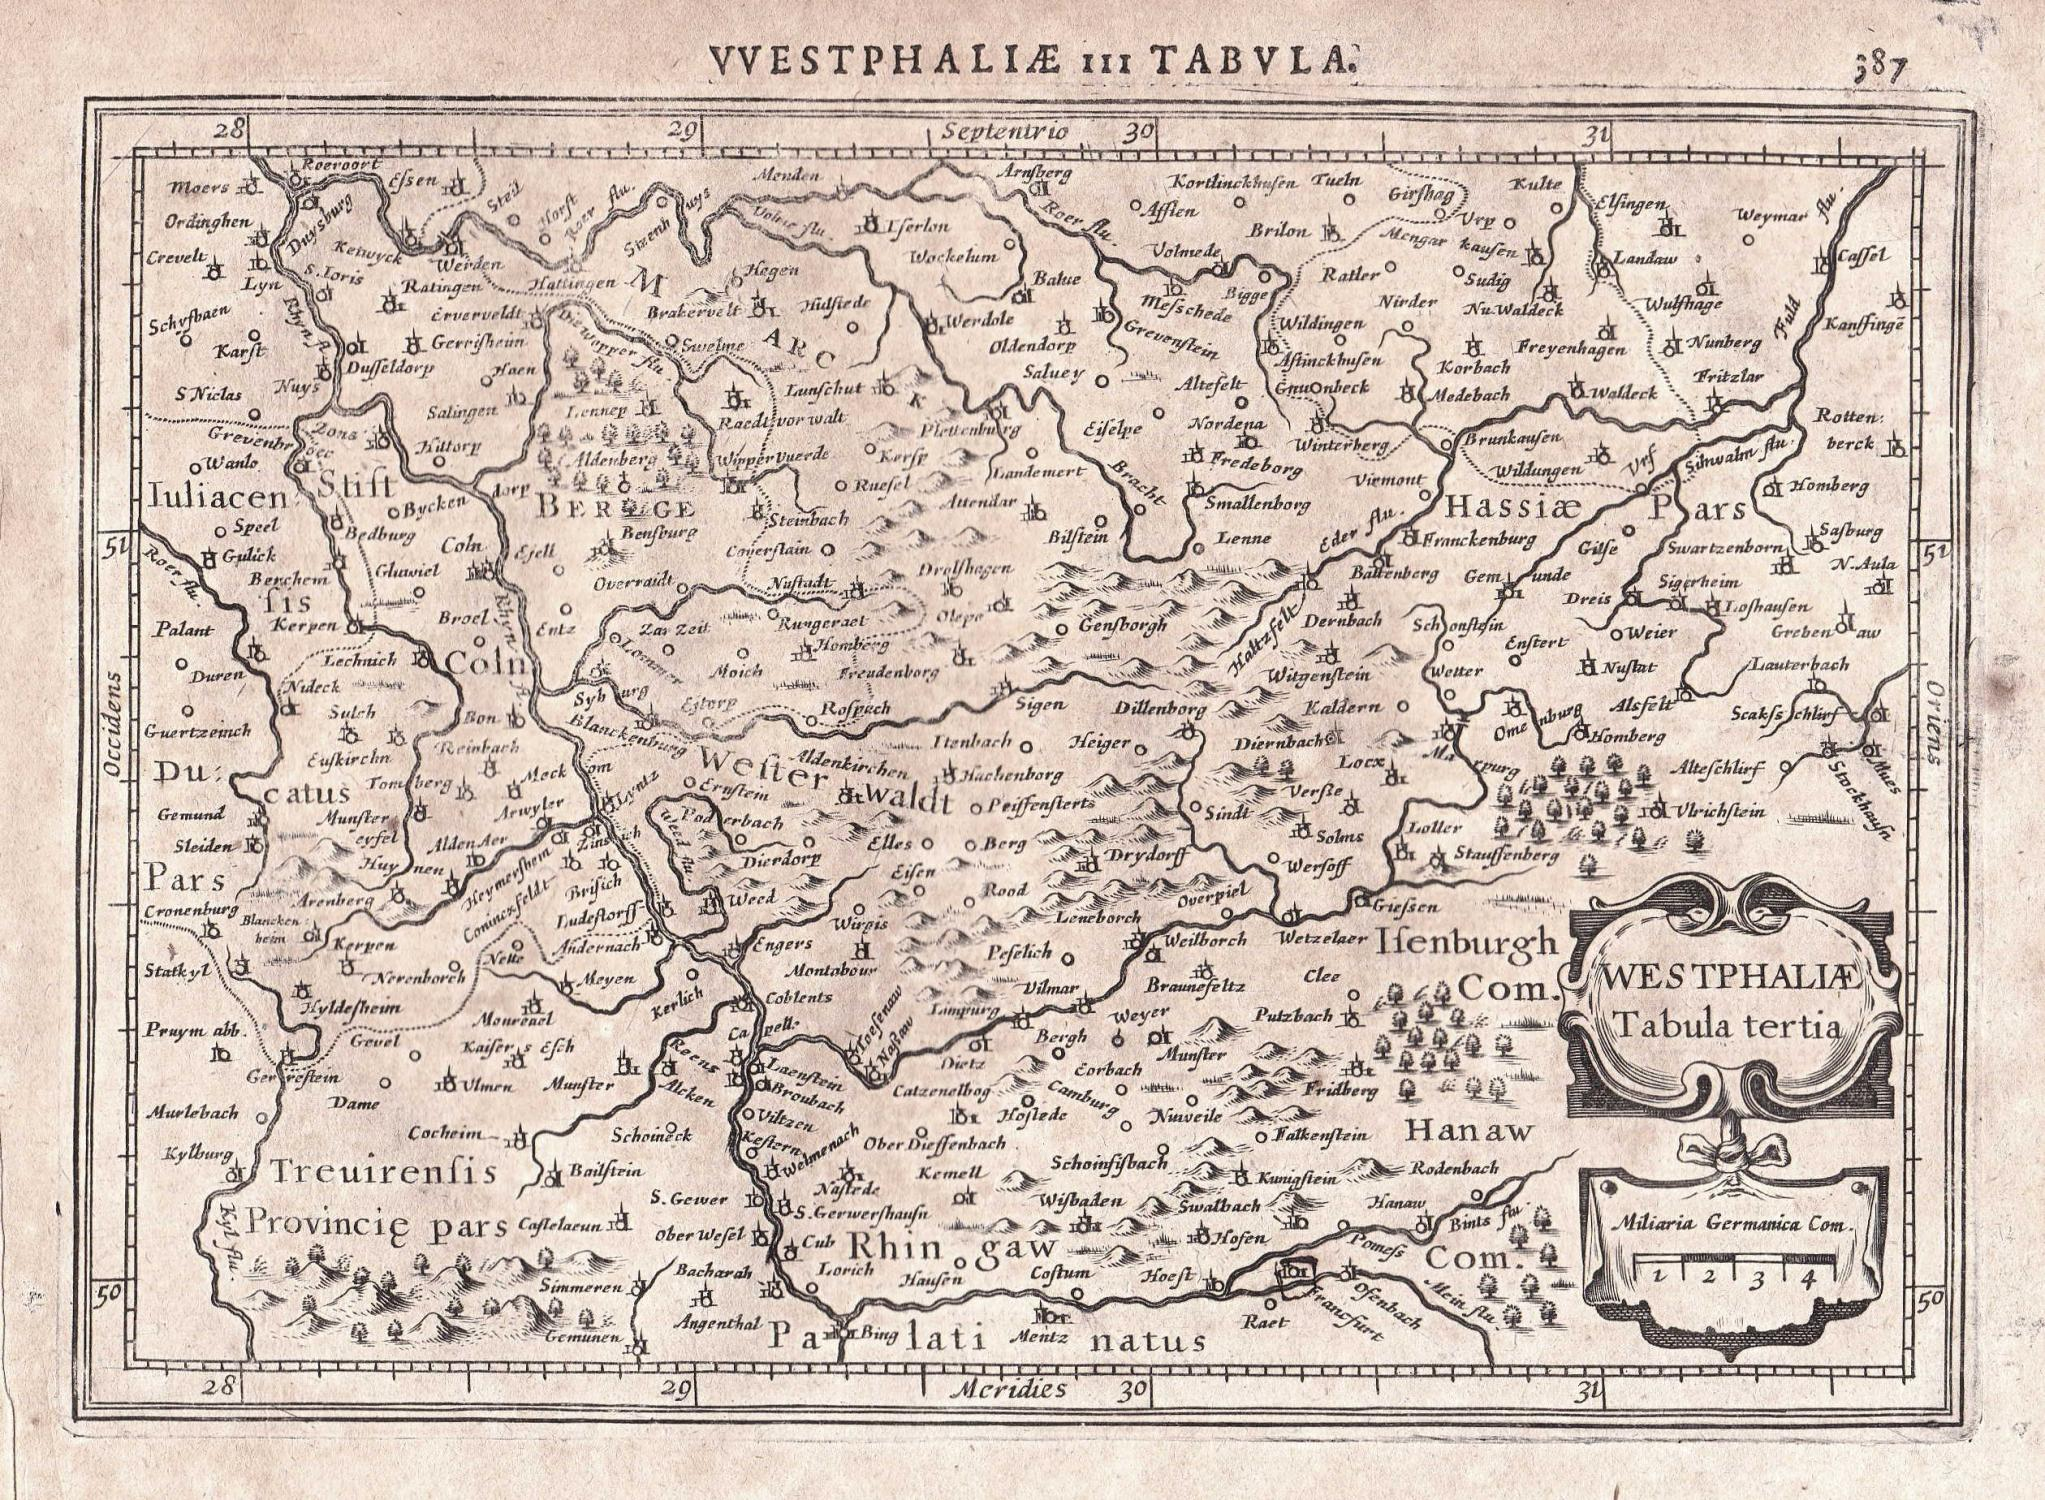 Köln Karte Deutschland.Köln Karte Tabula Zvab